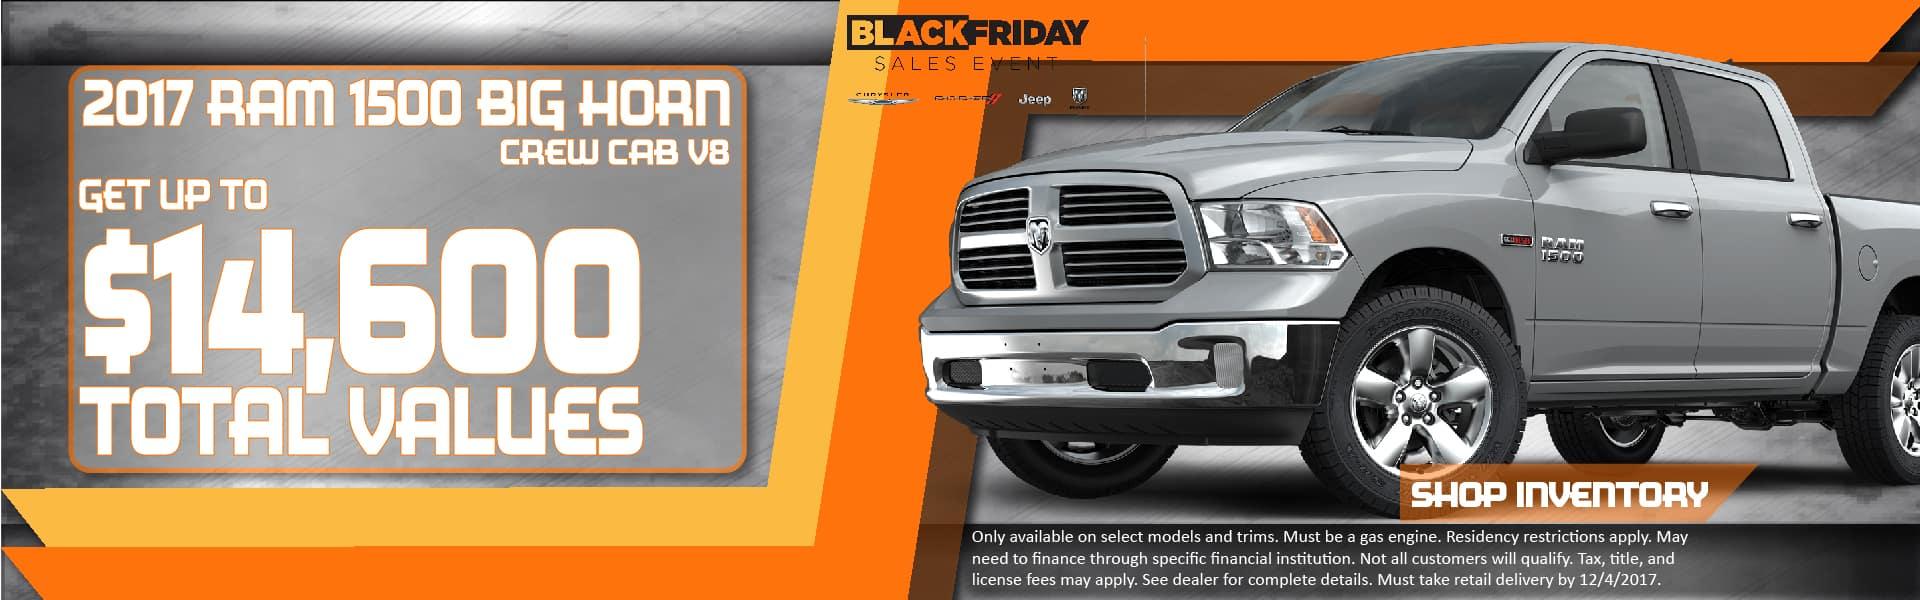 Tate Branch Artesia Chrysler Dodge Jeep Ram Dealer In ...